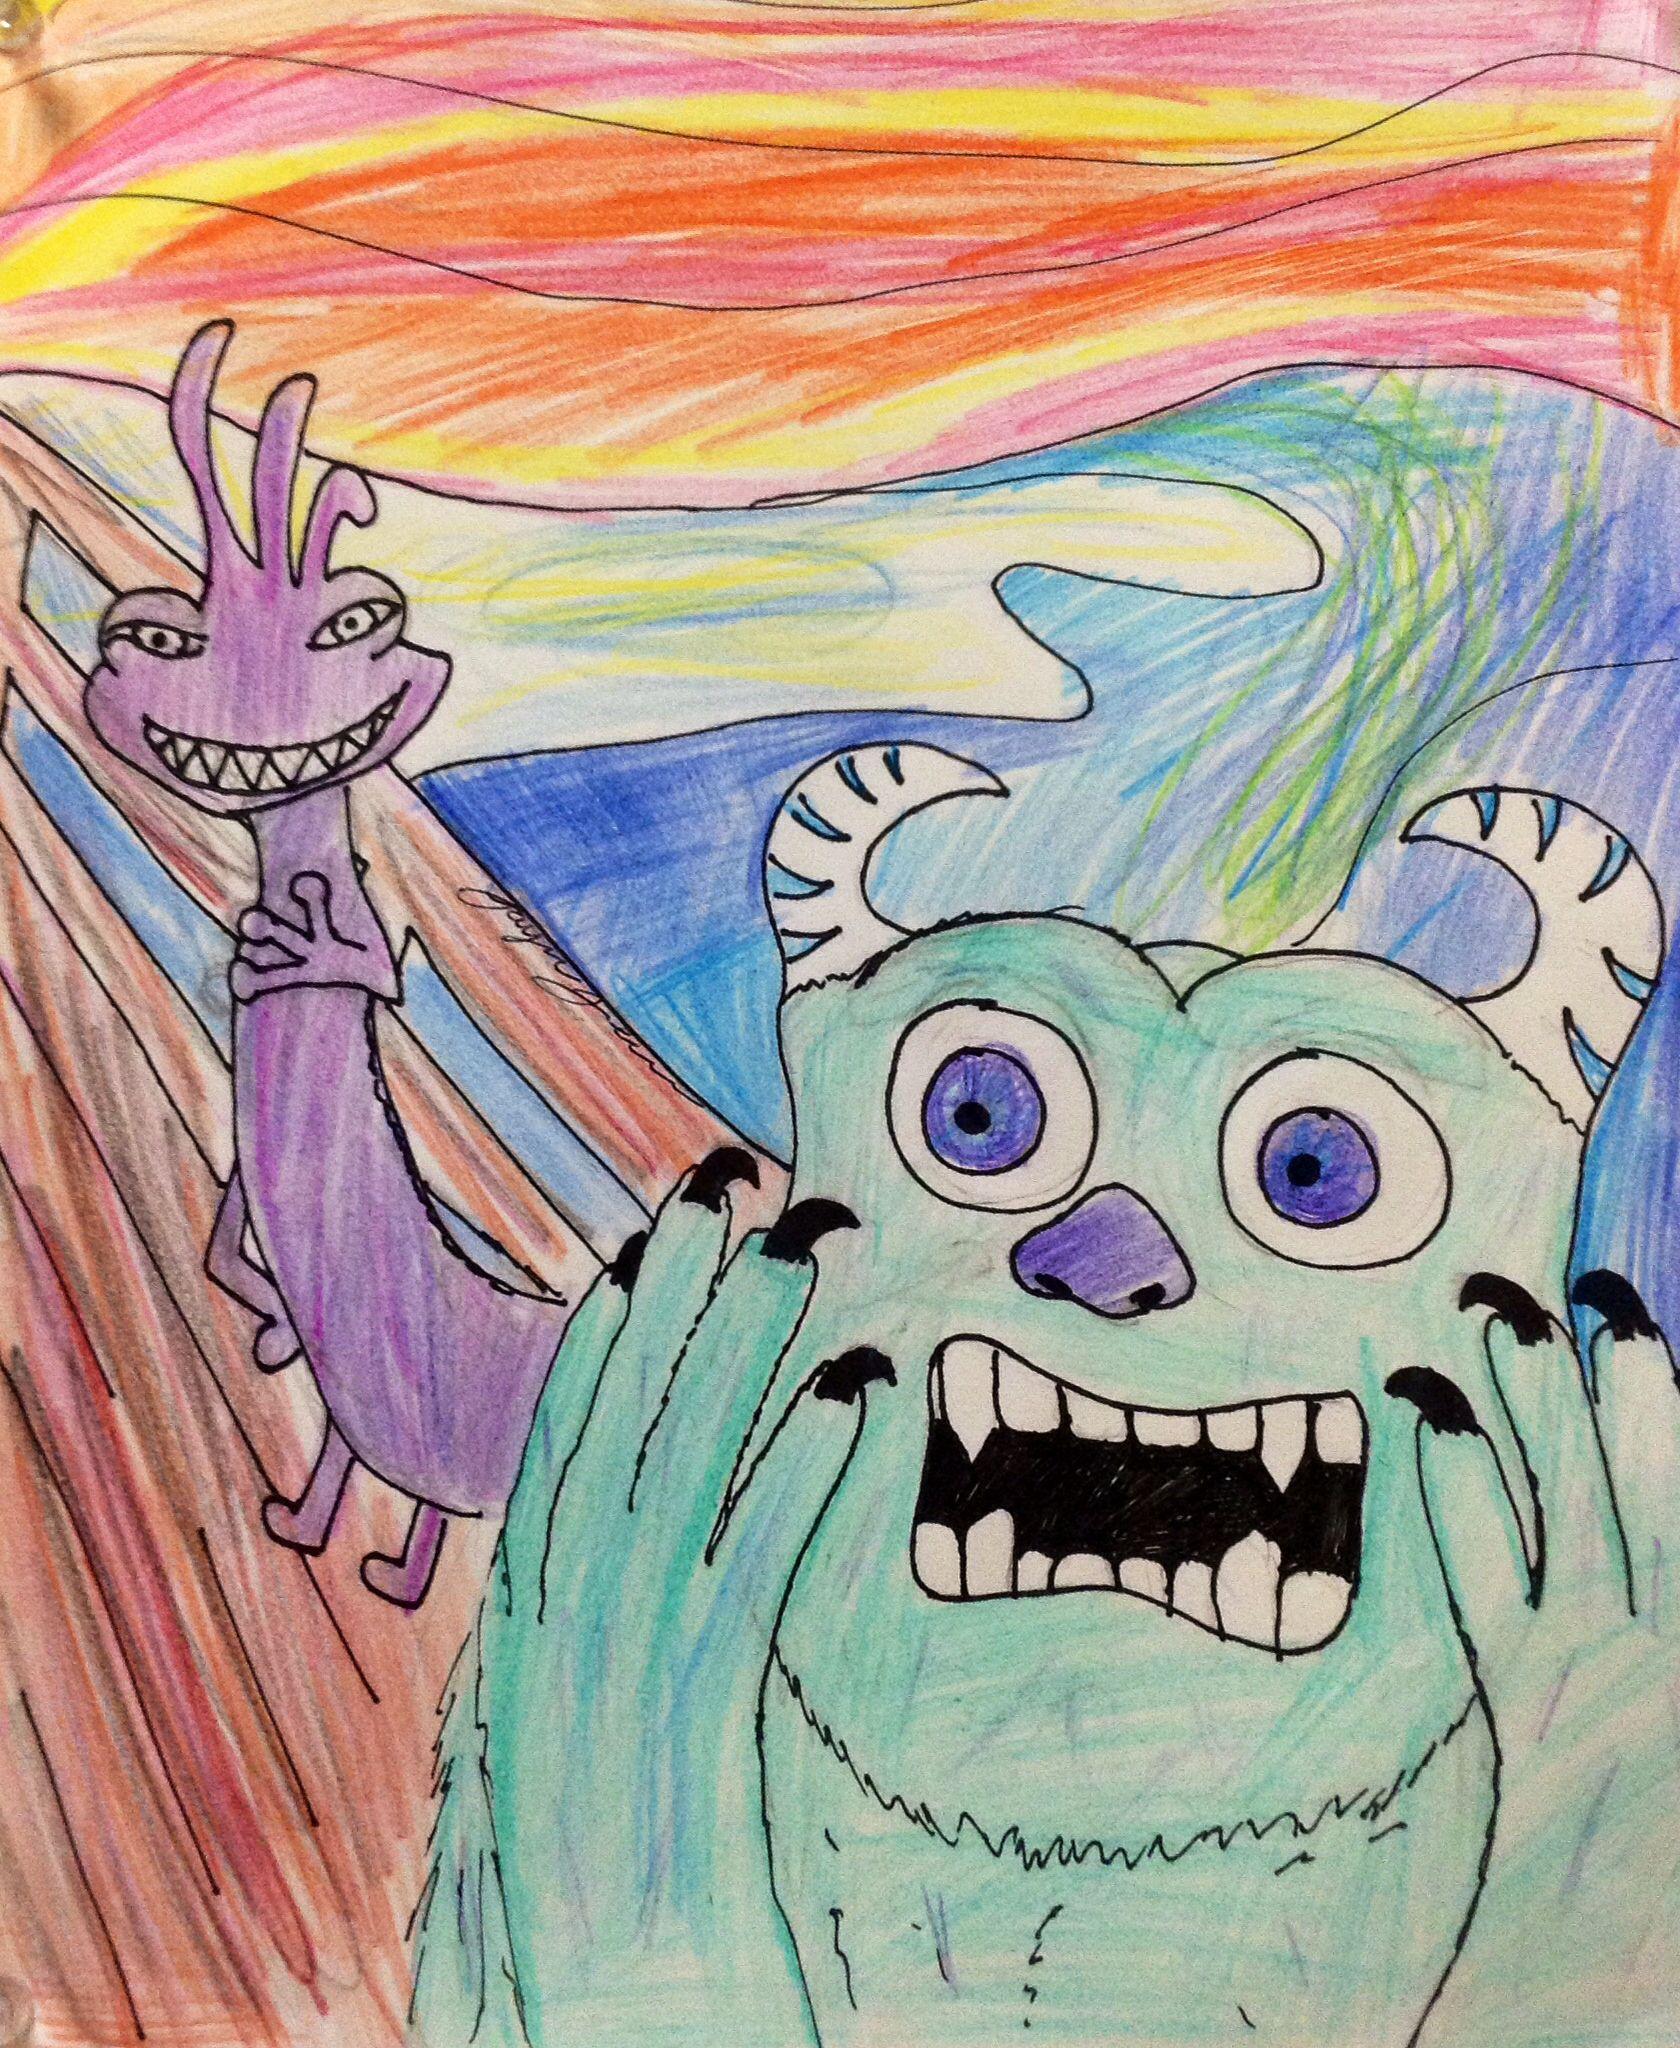 The Scream parody   Art parody, Scream parody, Elementary art